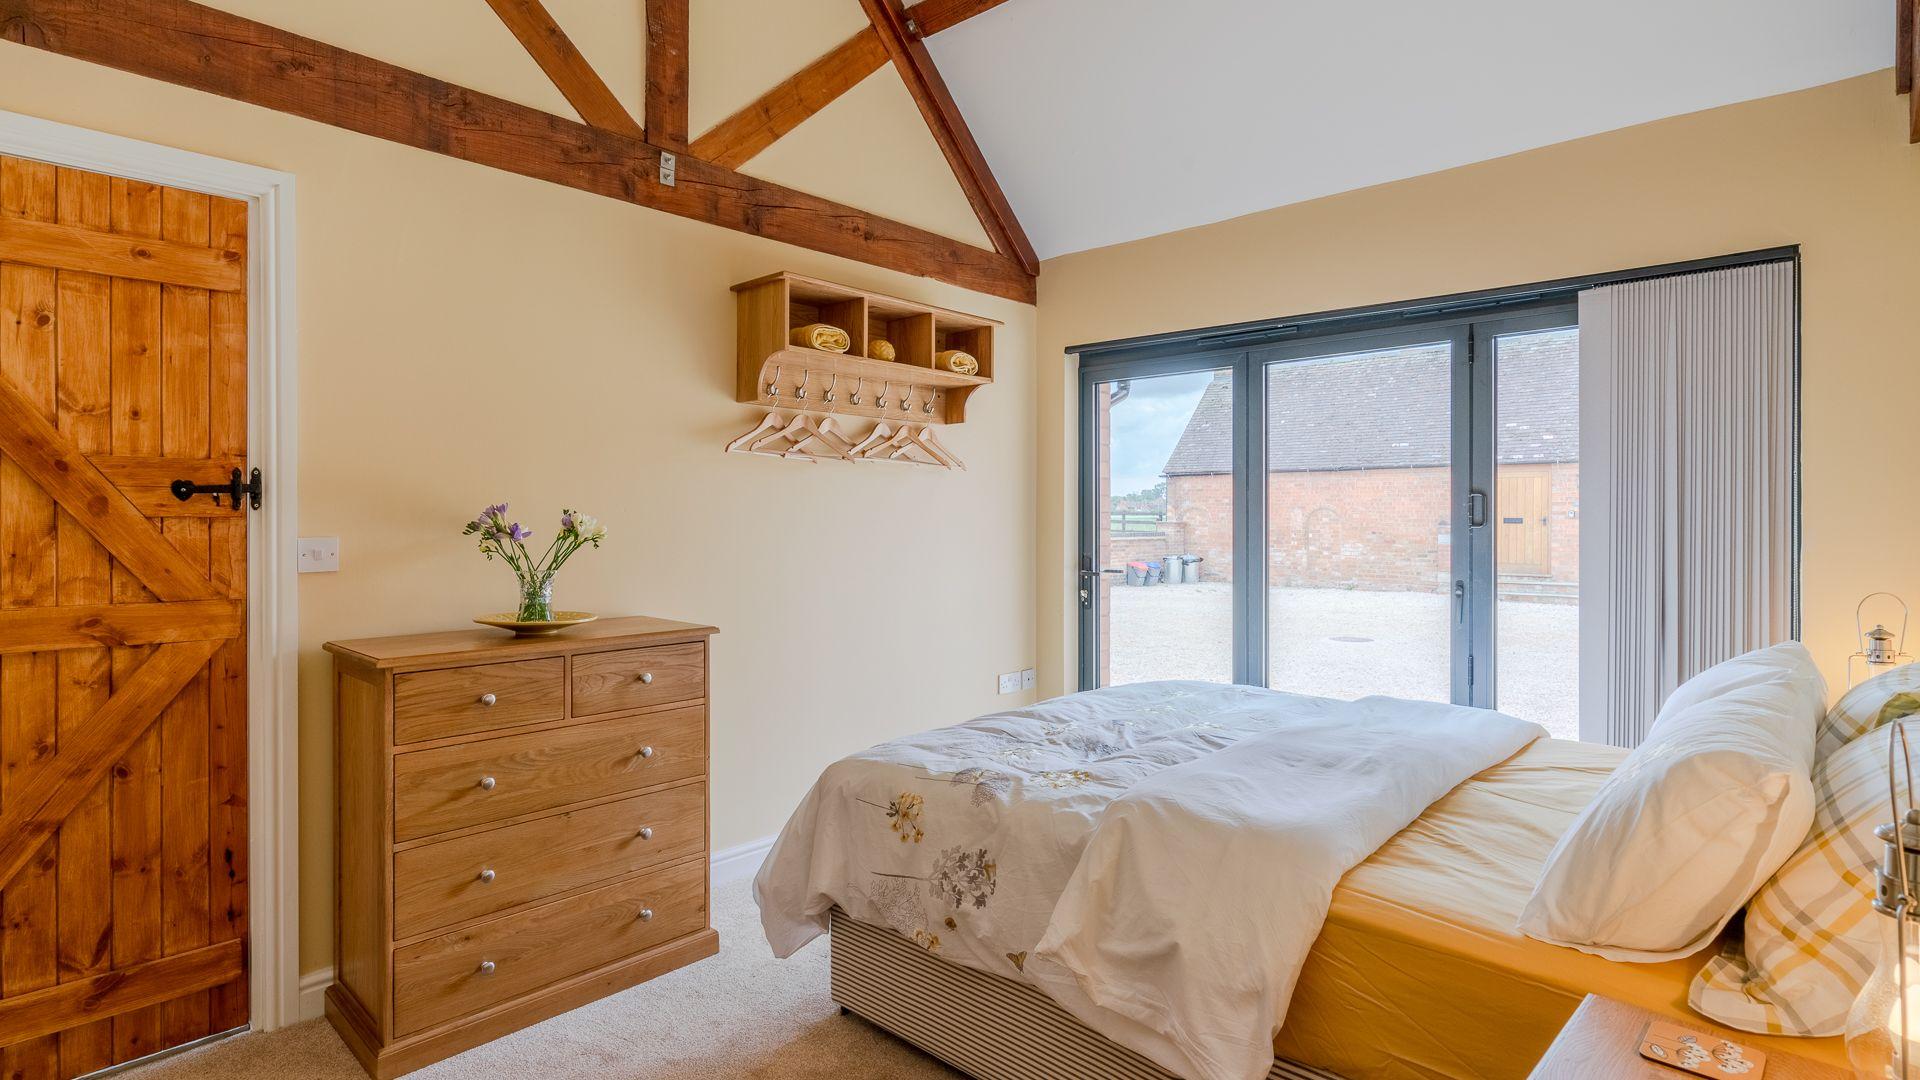 Bedroom, Swifts Retreat, Bolthole Retreats